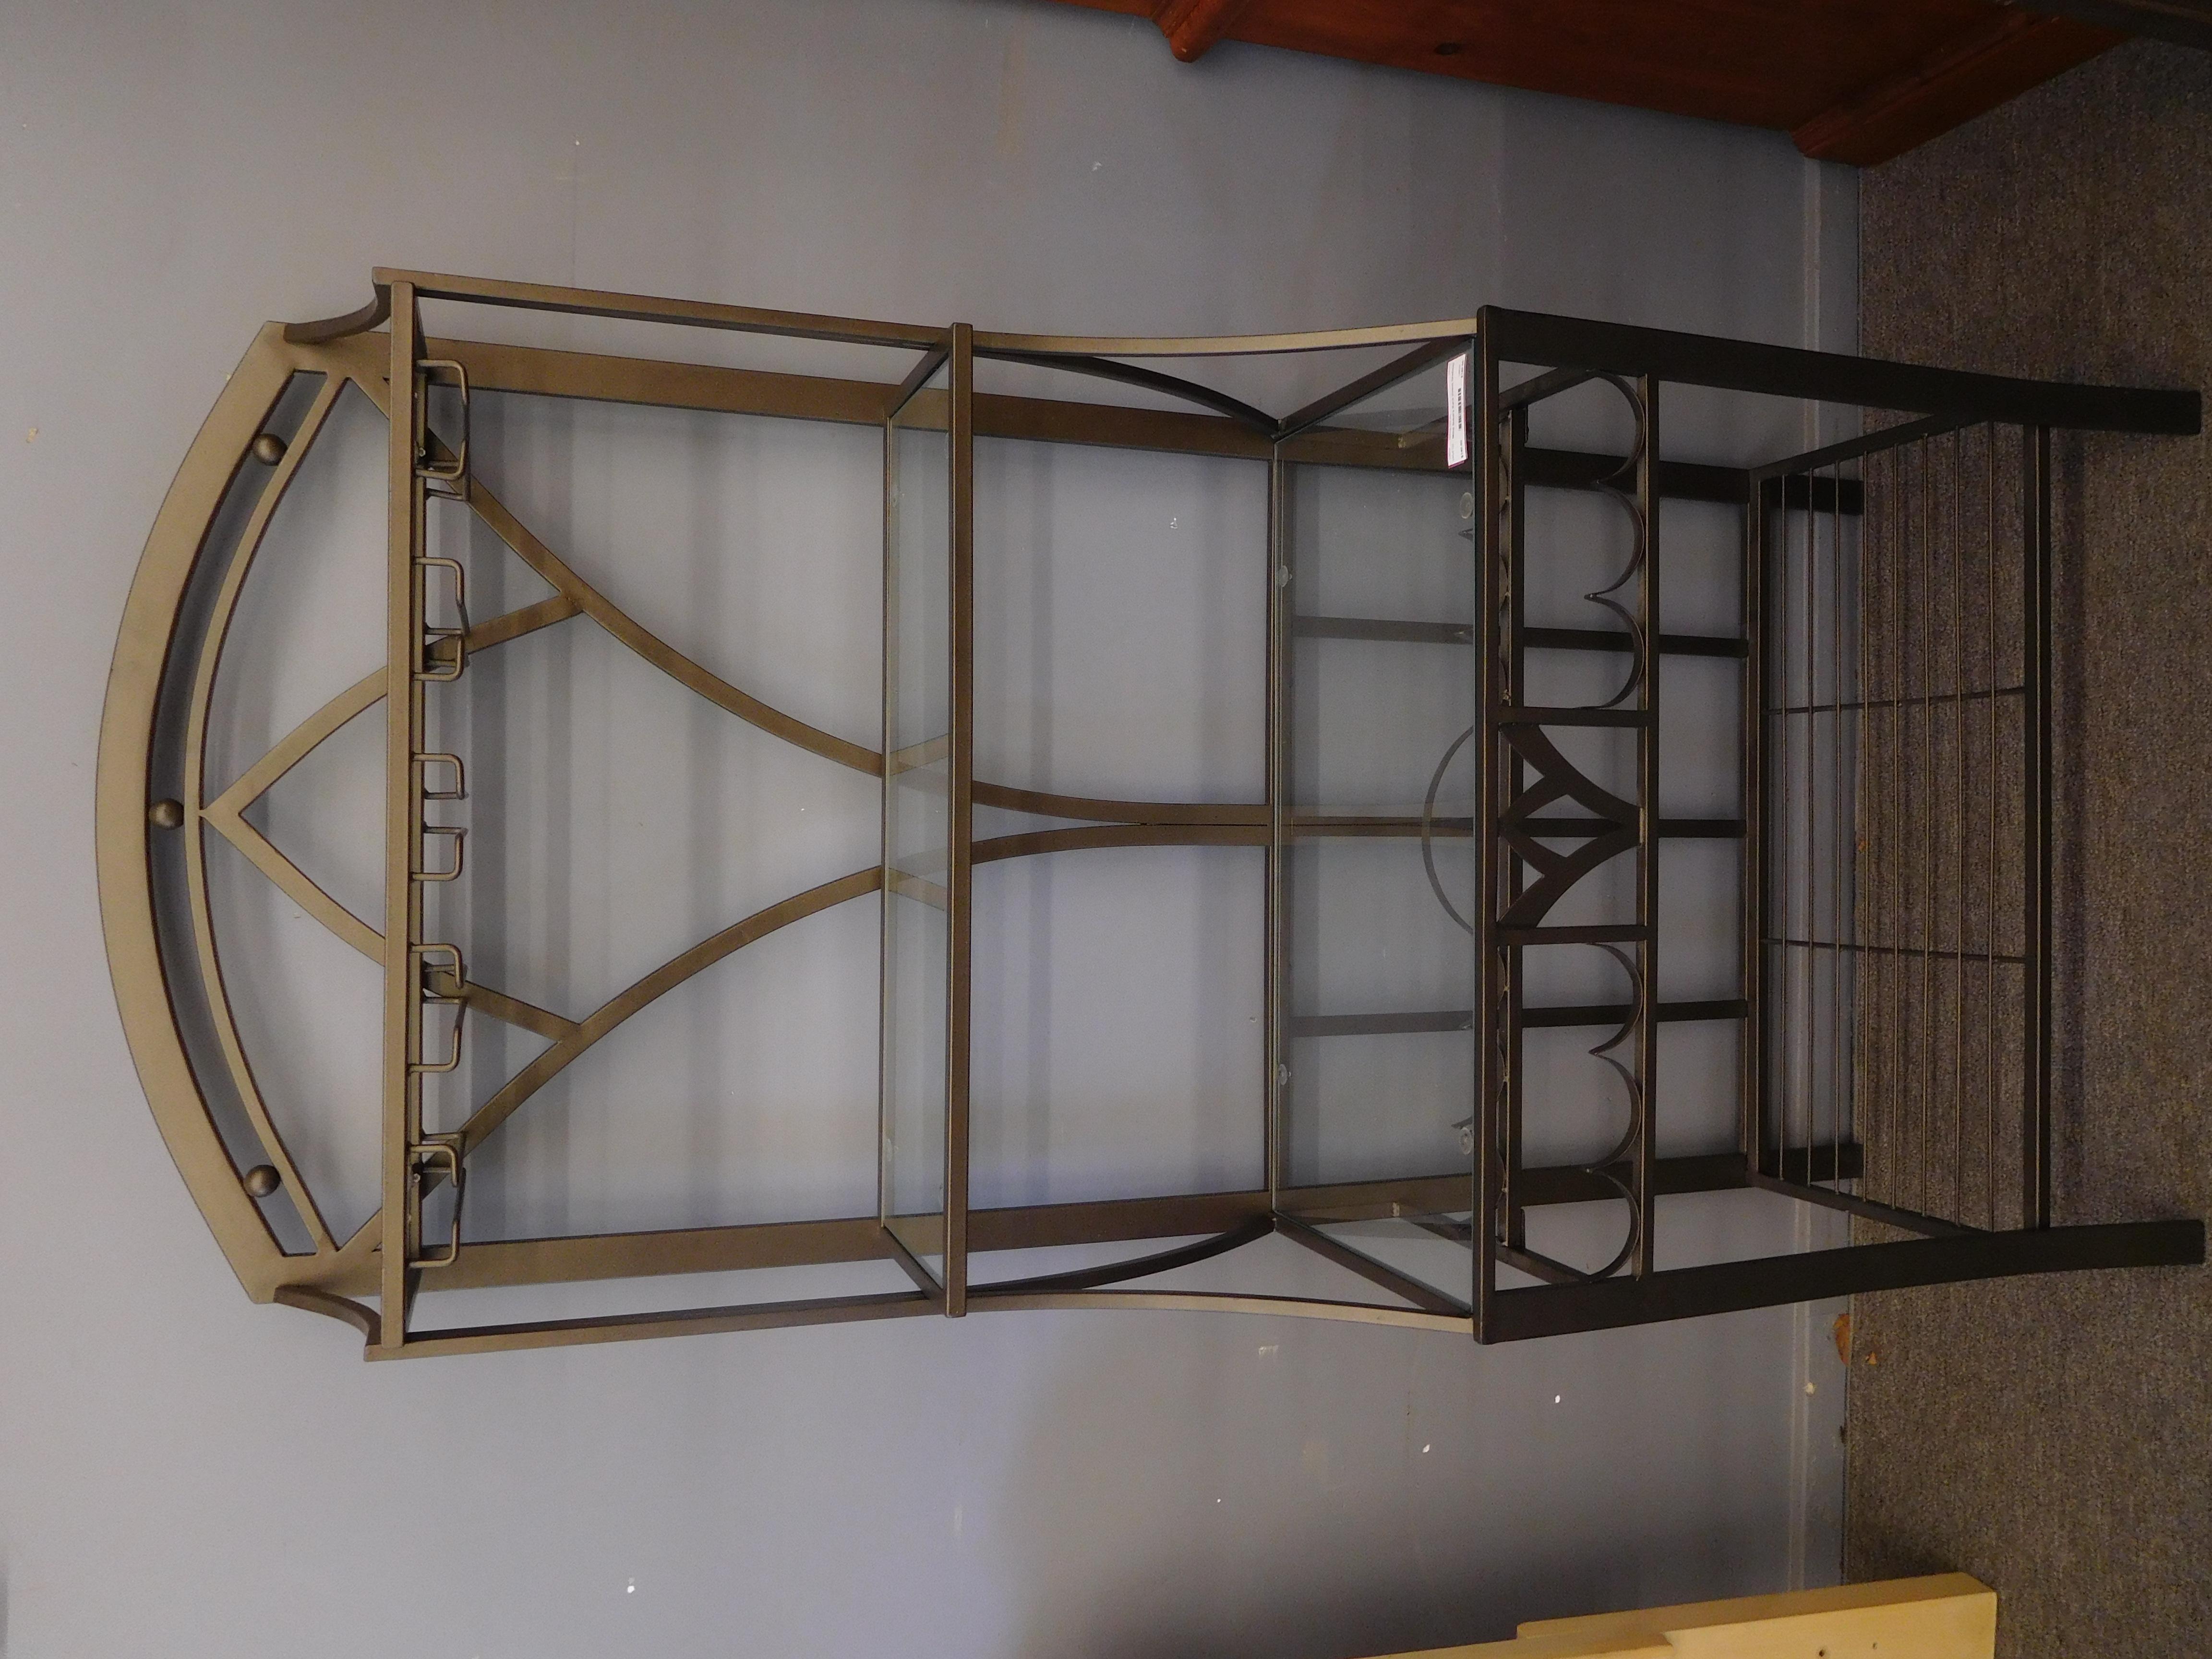 Deco-Inspired Metal Baker's Rack with Glass Shelves